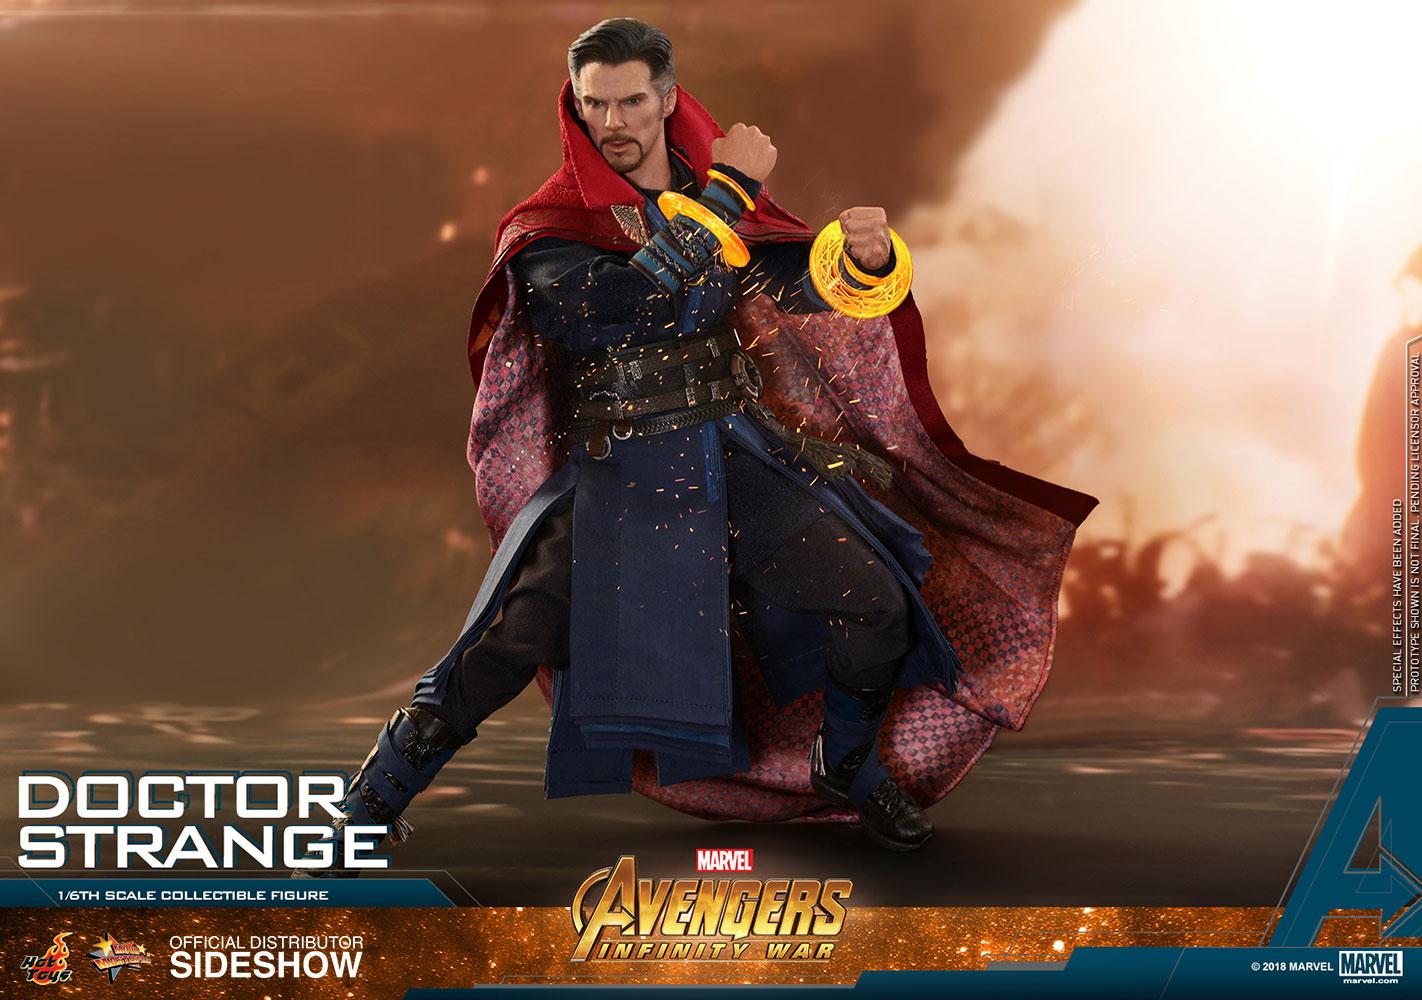 Ropes Mystic Effect Hot Toys 1//6 MMS484 Avengers Infinity War Doctor Strange